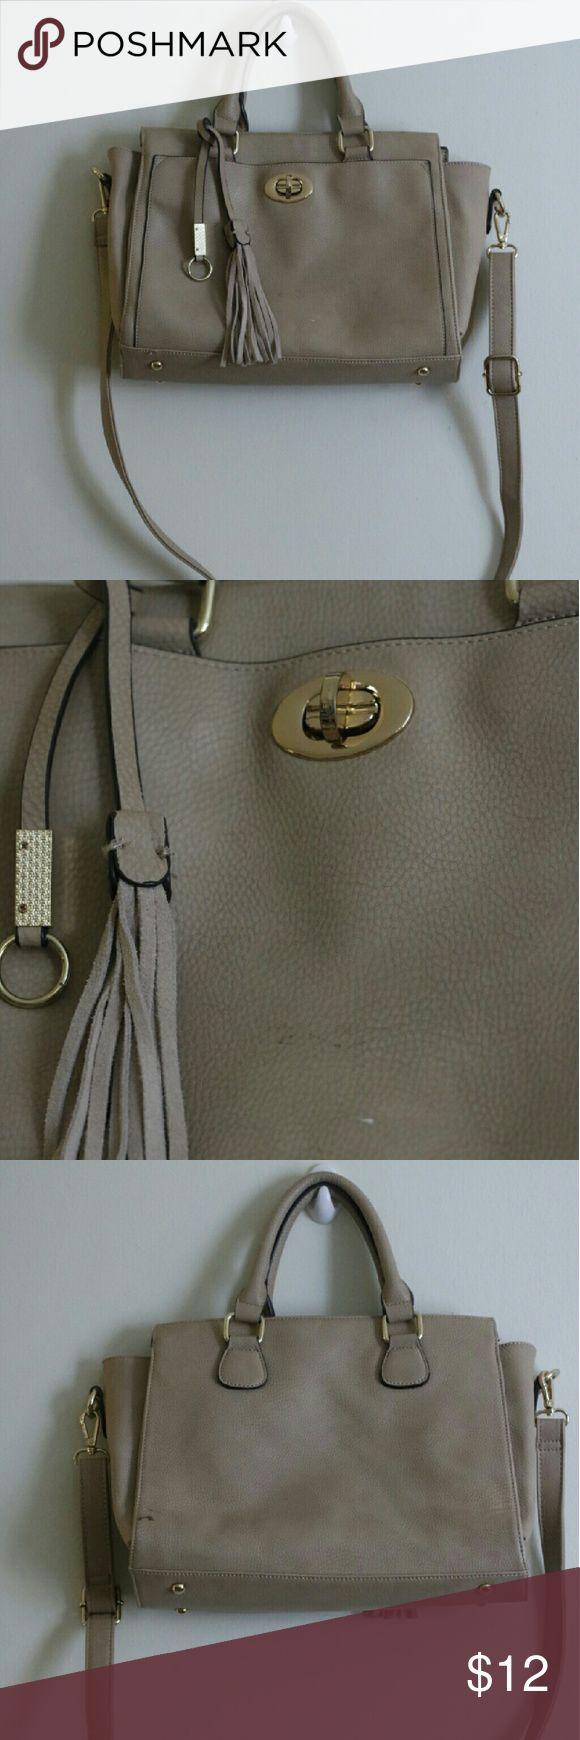 Crossbody handbag Little wear, see images. Lots of space! Michael Kors for exposure Michael Kors Bags Crossbody Bags